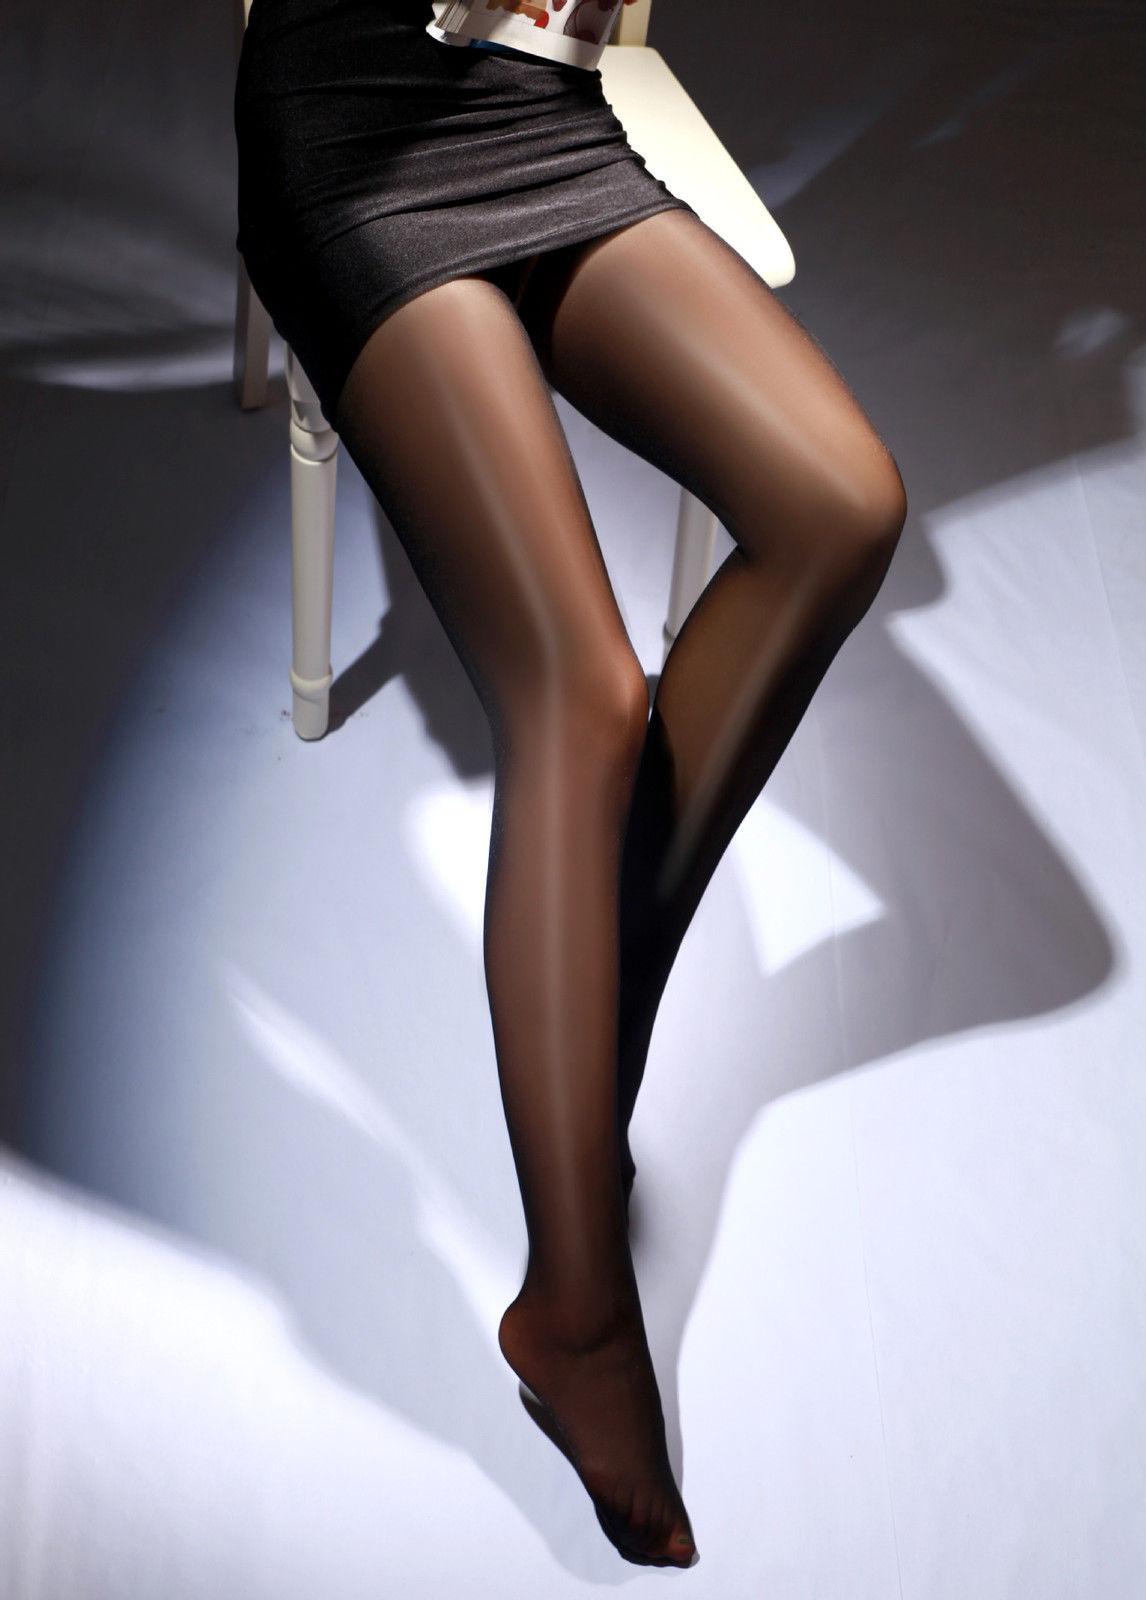 Brand New Sexy Women Stockings Sheer Oil Shiny Glossy Classic Pantyhose Tights Stockings Hot High Waist Pantyhose Nightwear